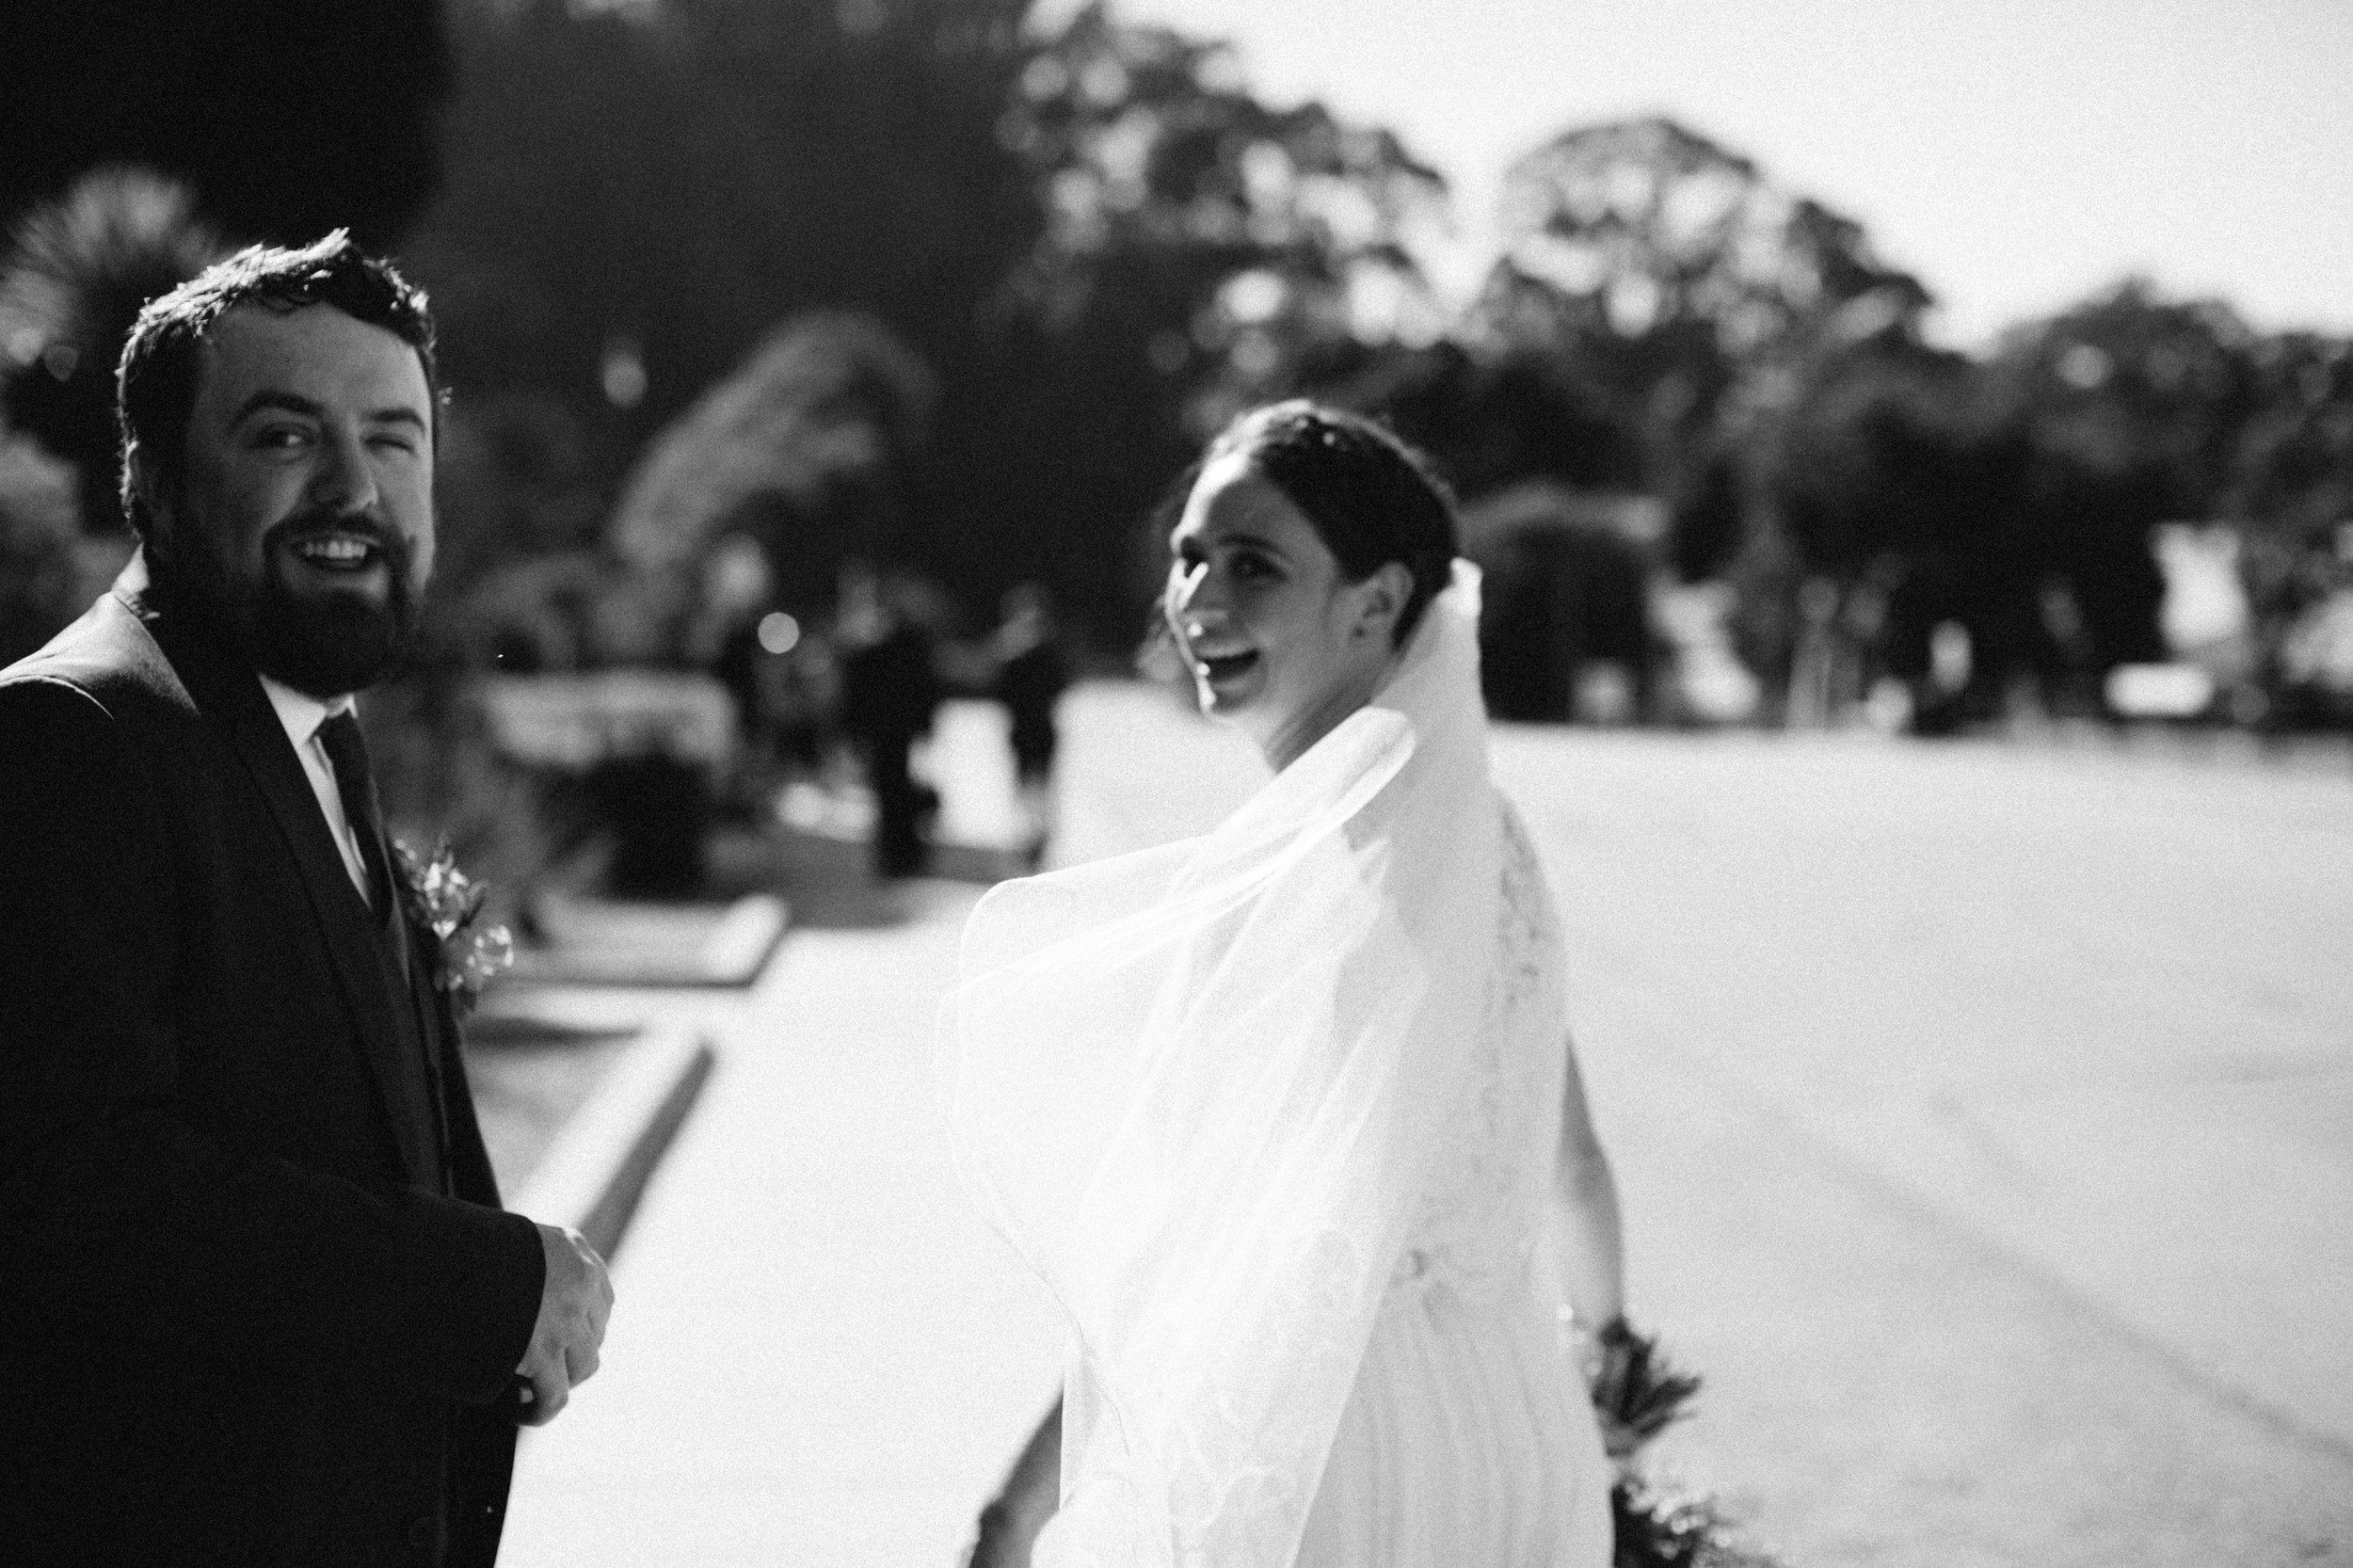 Tucker_Kristina_Wedding_Presidio_San_Francisco_Abigail_Malone_Photography-783.jpg